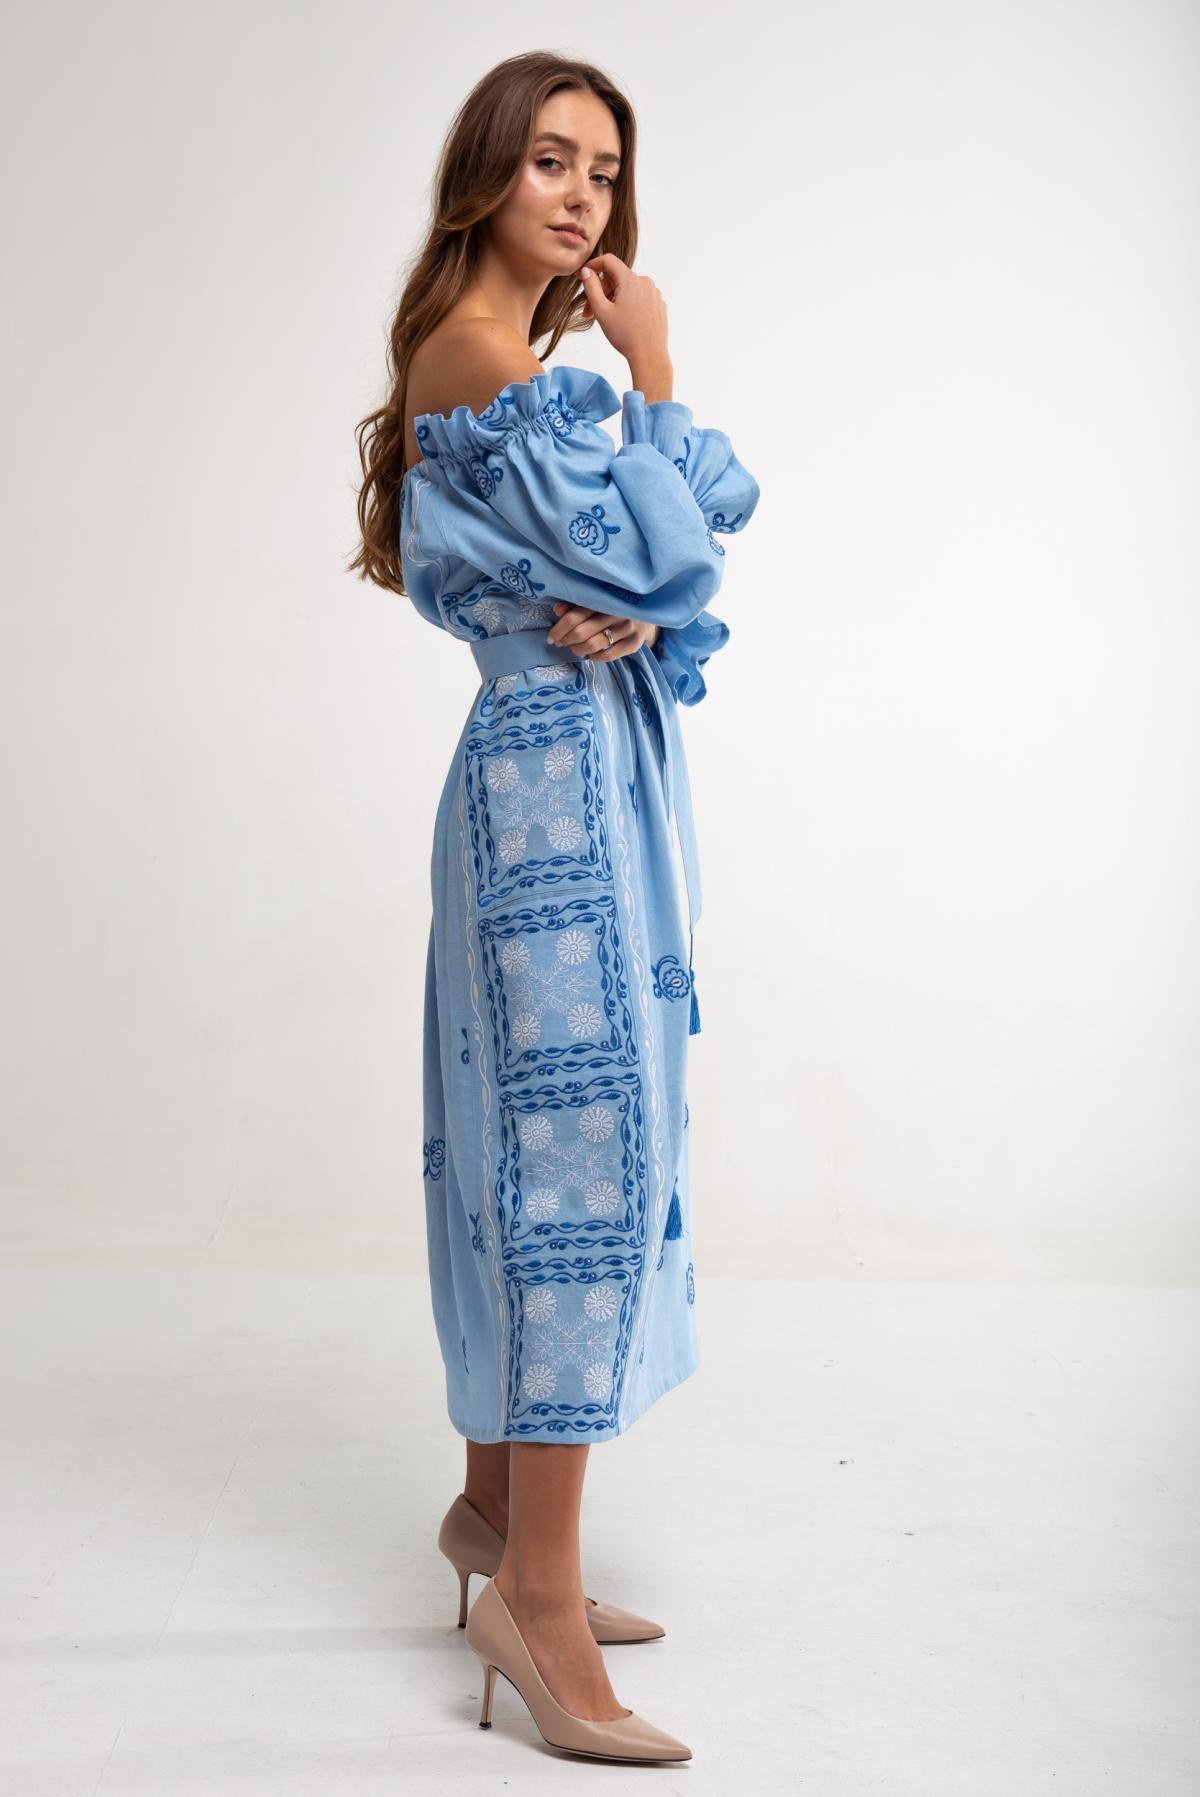 Embroidered dress Barvinok blue. Photo №2. | Narodnyi dim Ukraine